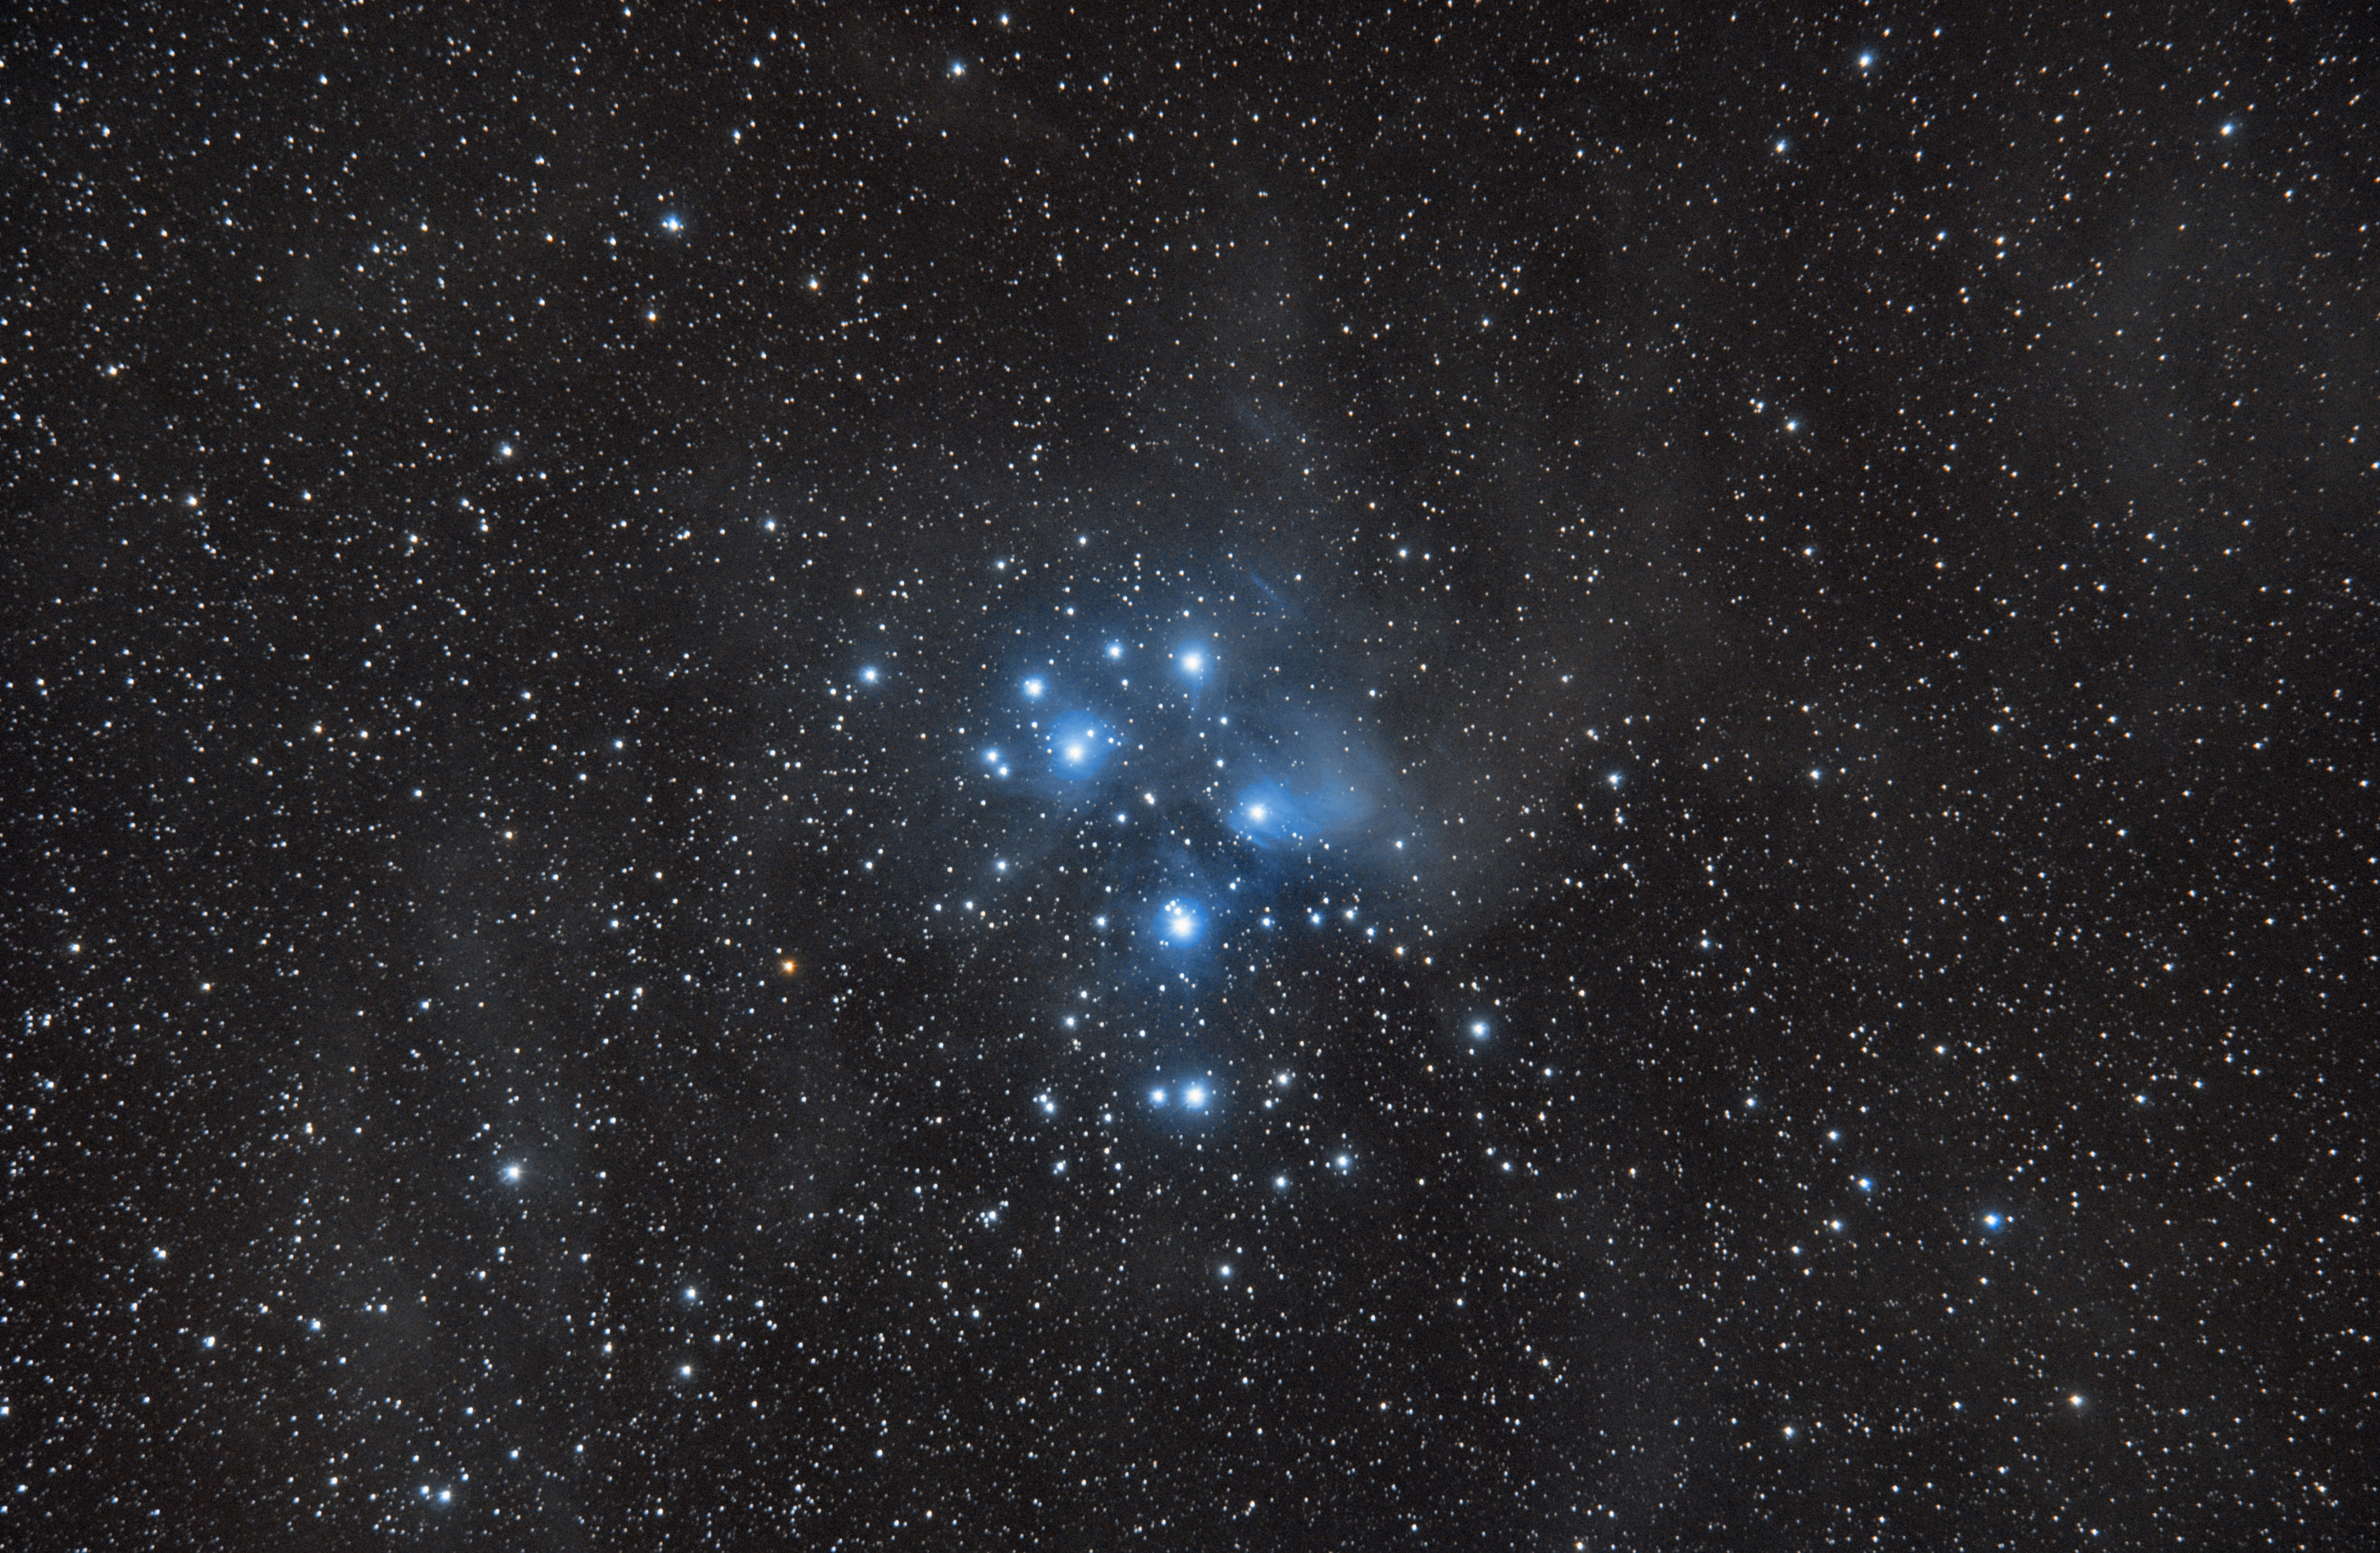 M45- The Pleiades